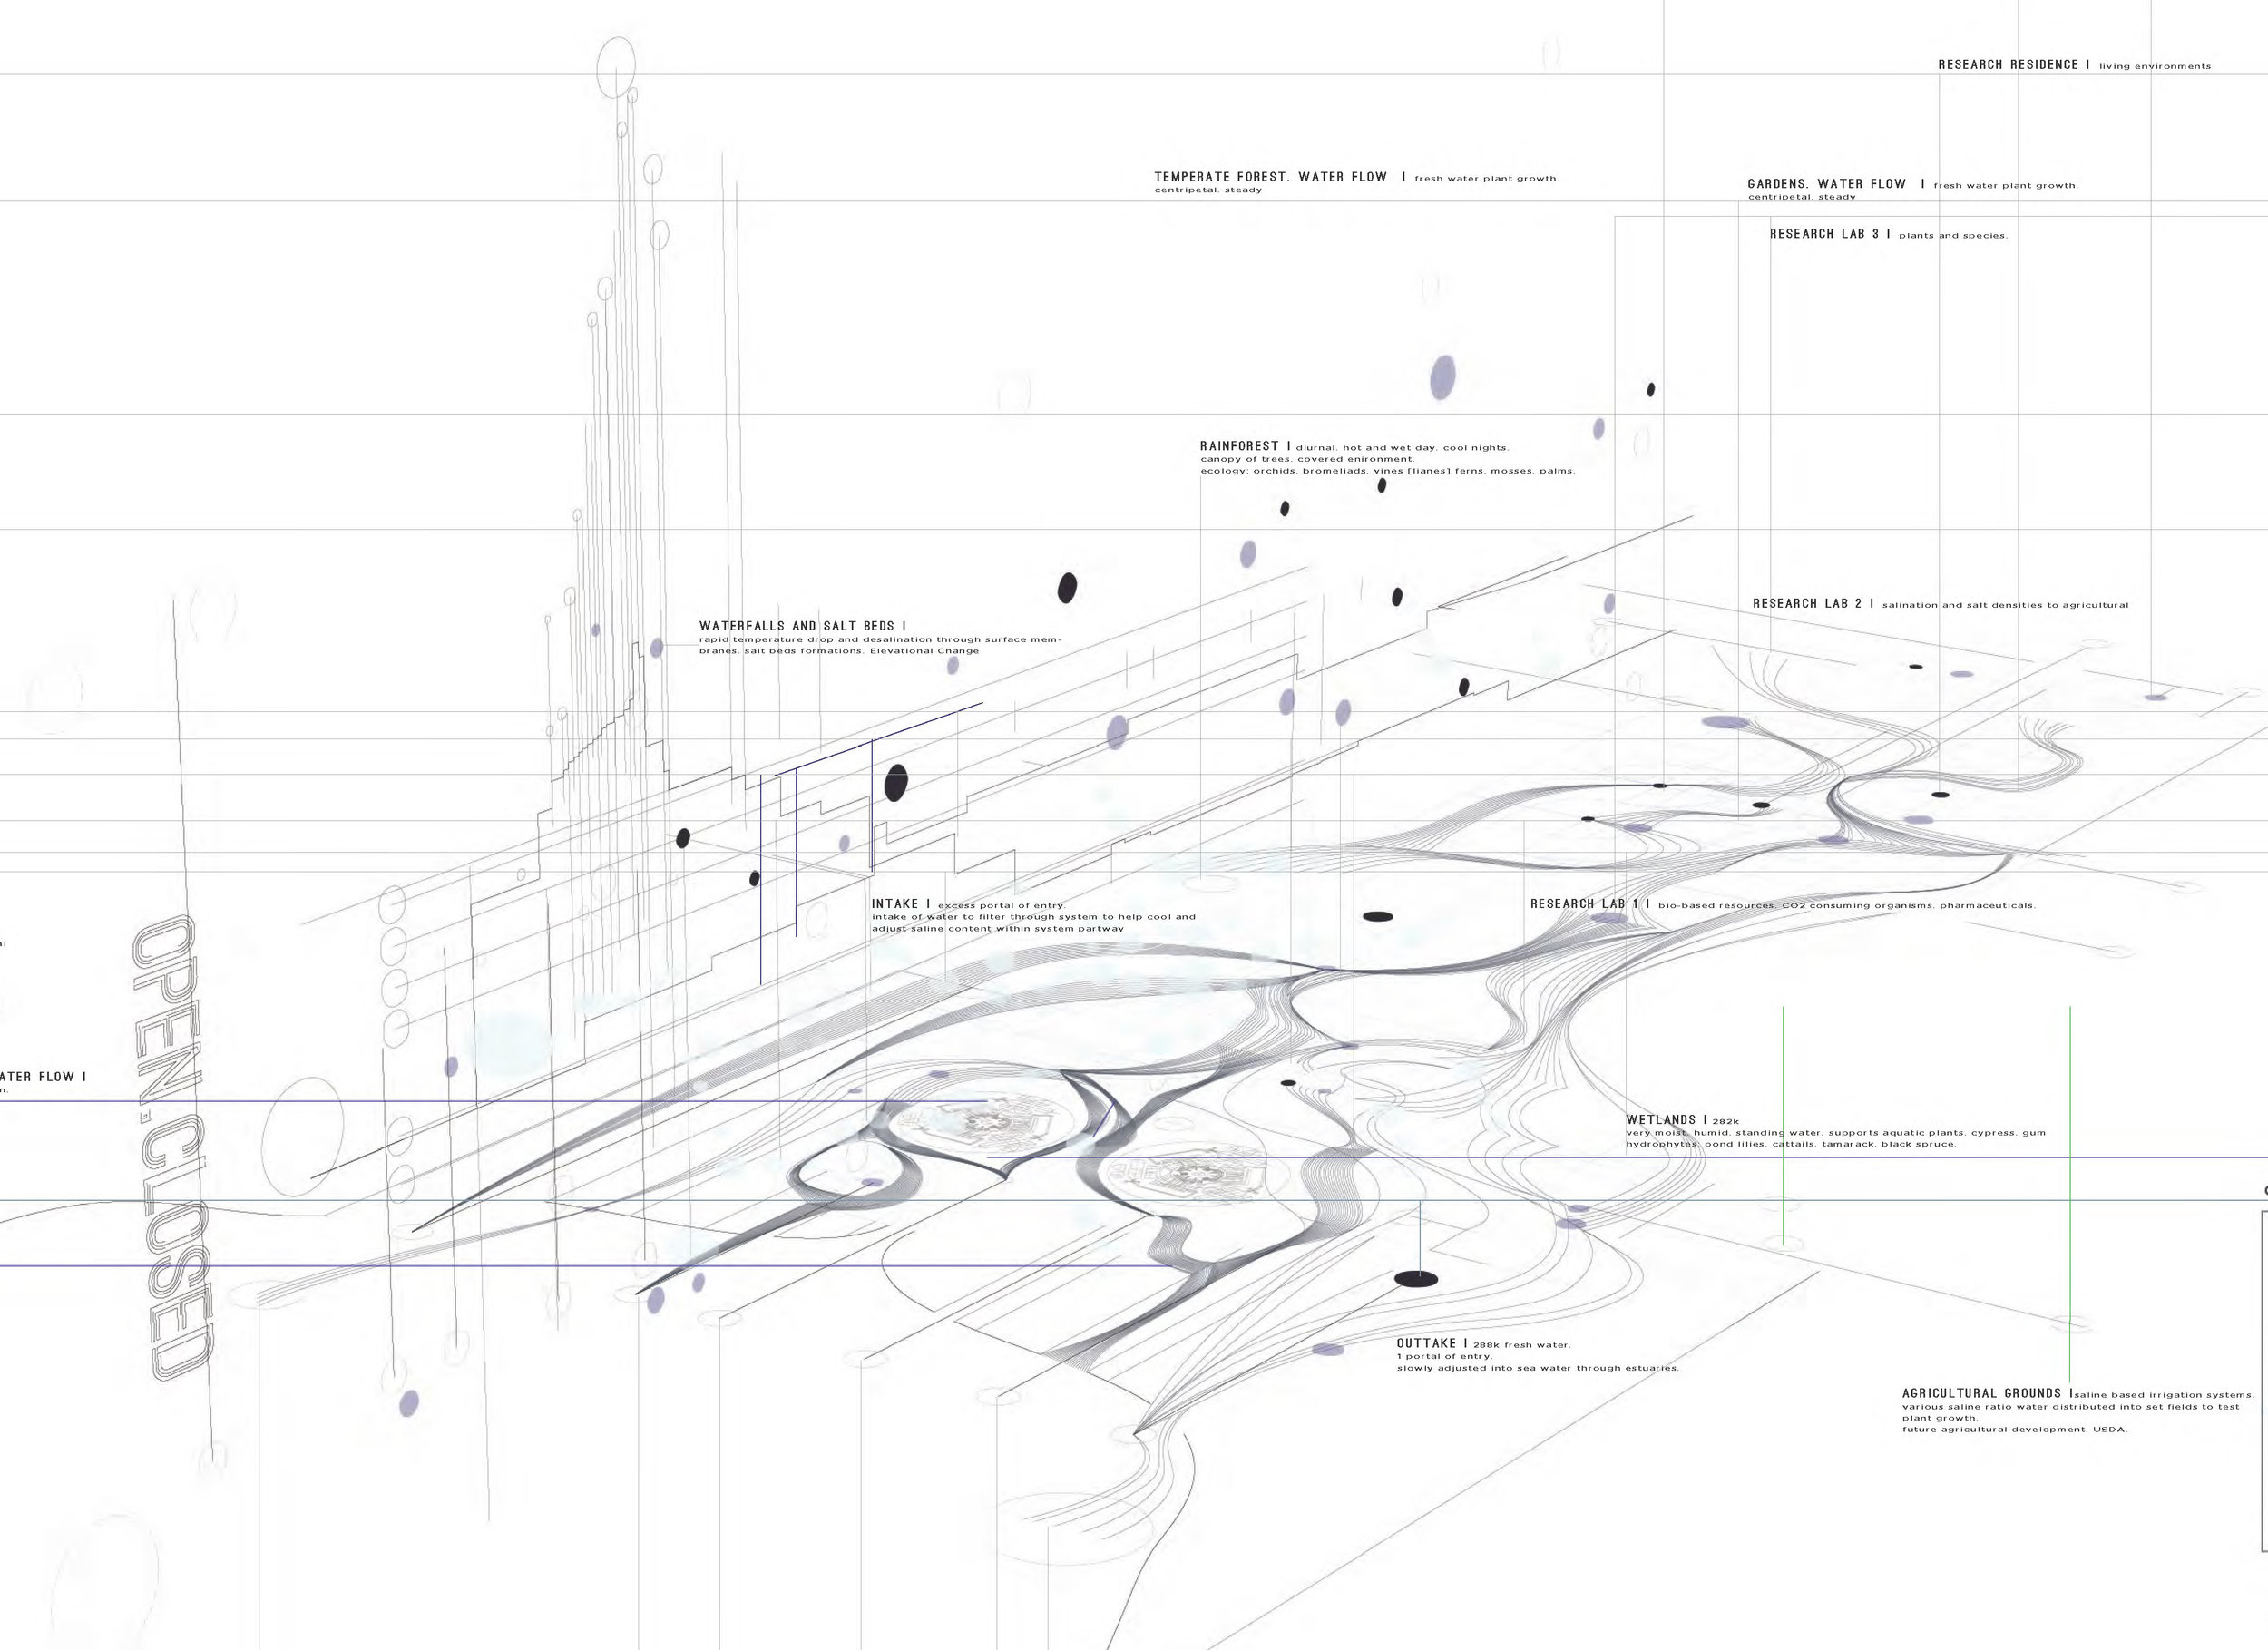 Copy of MDuellman_ARCH607-04_33x33.jpg